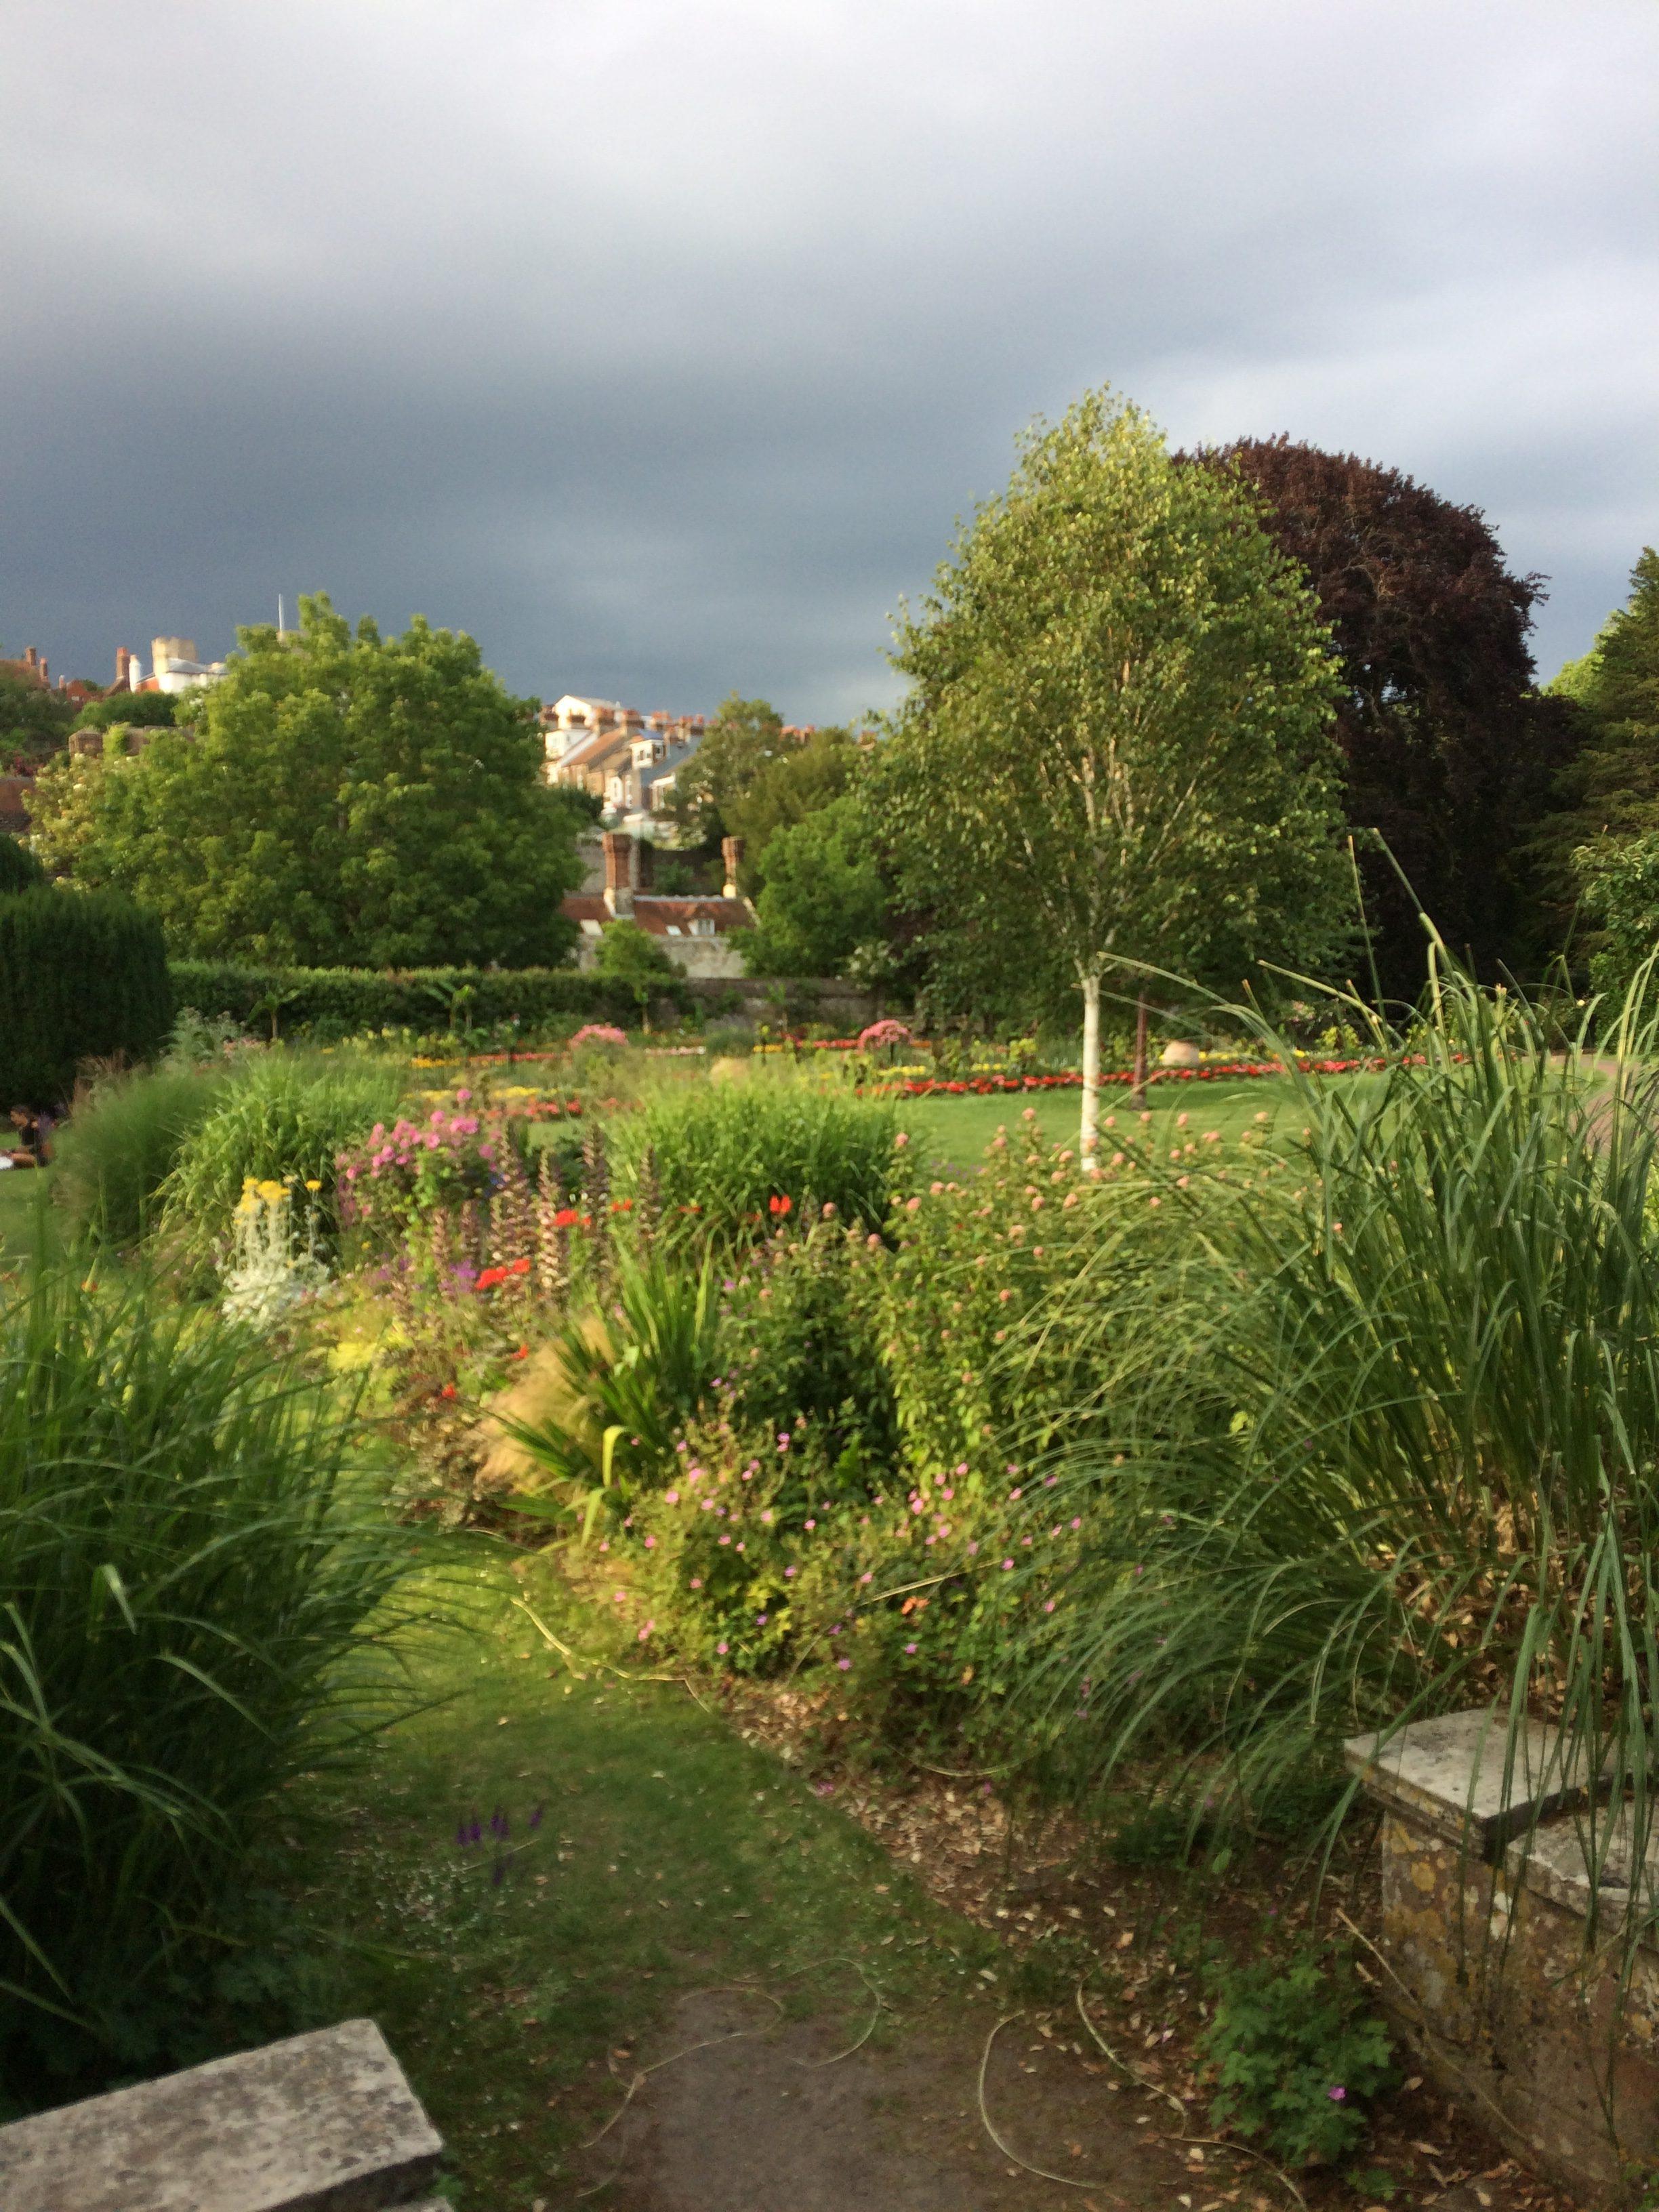 angielski ogród w Lewes